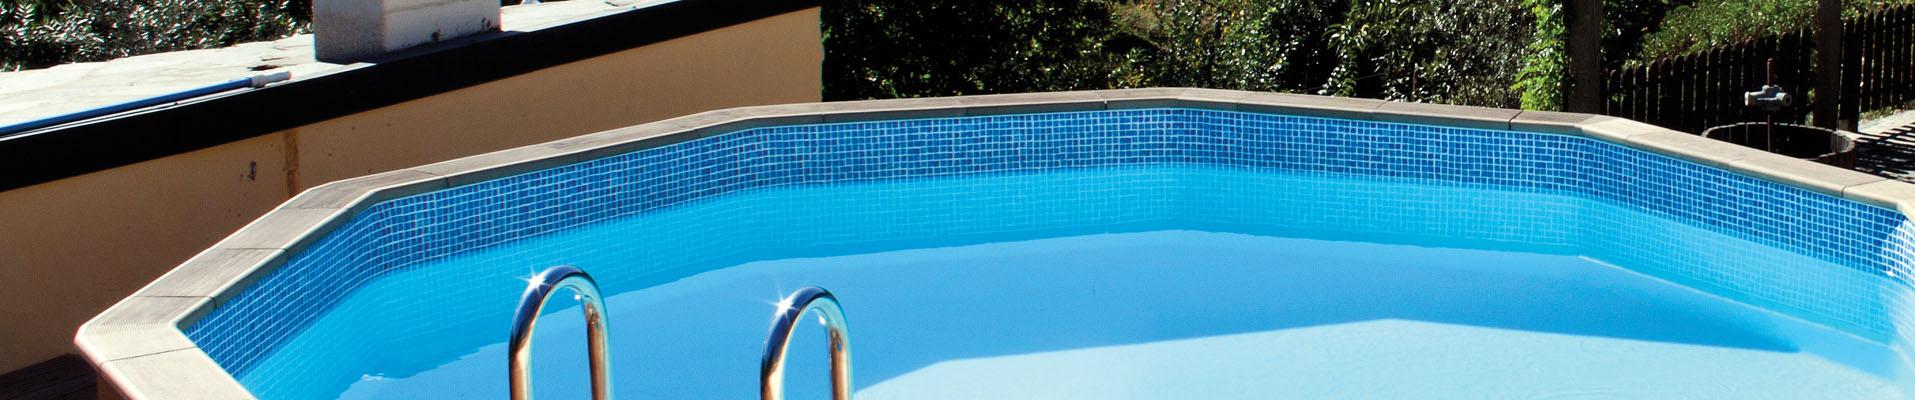 piscina NATURALIS